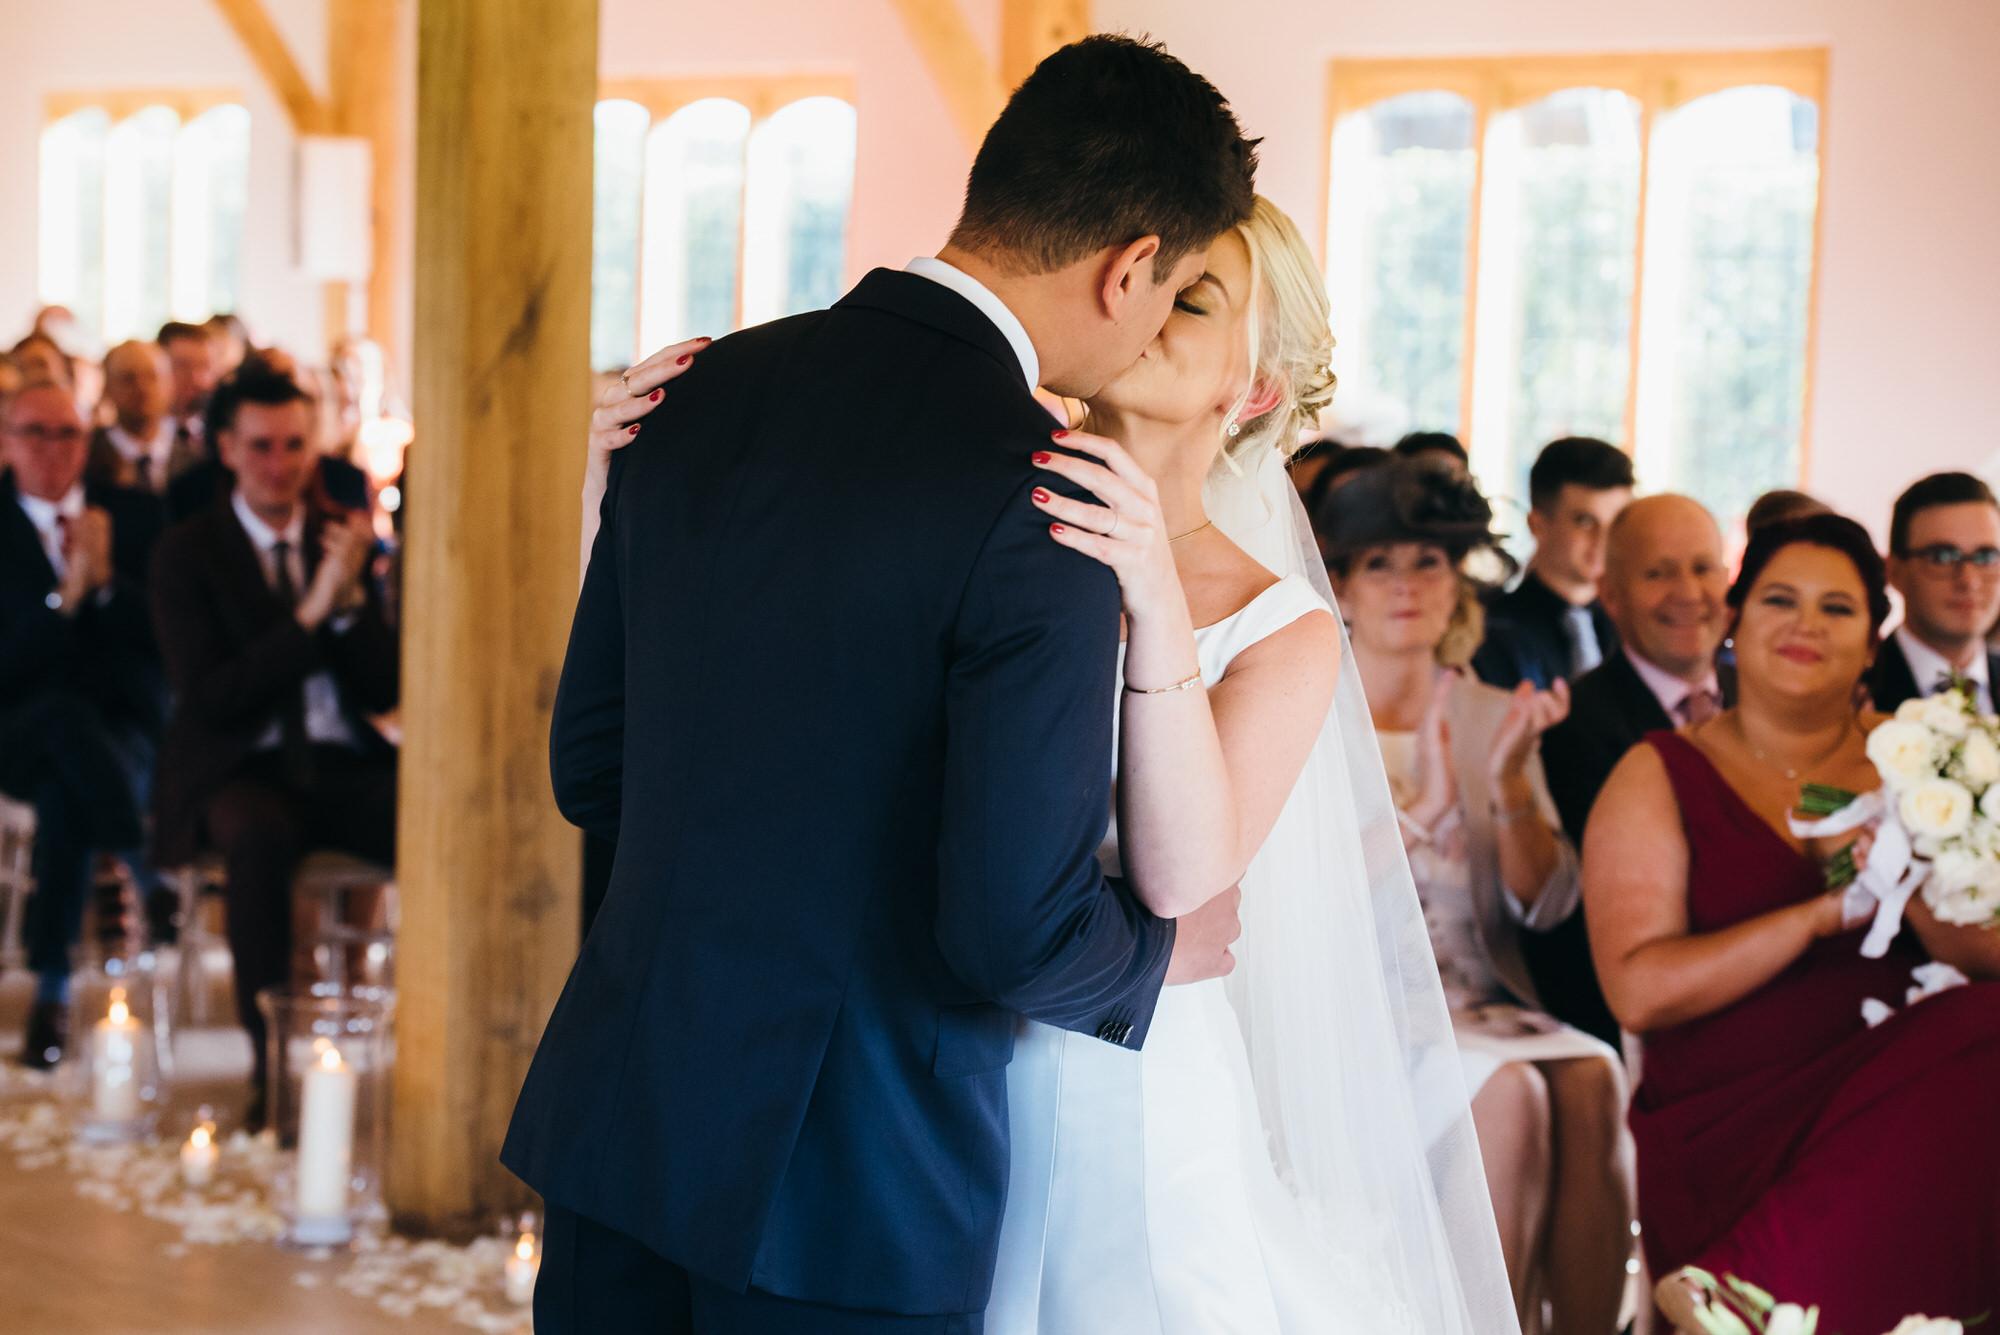 Merrydale manor wedding photography 047